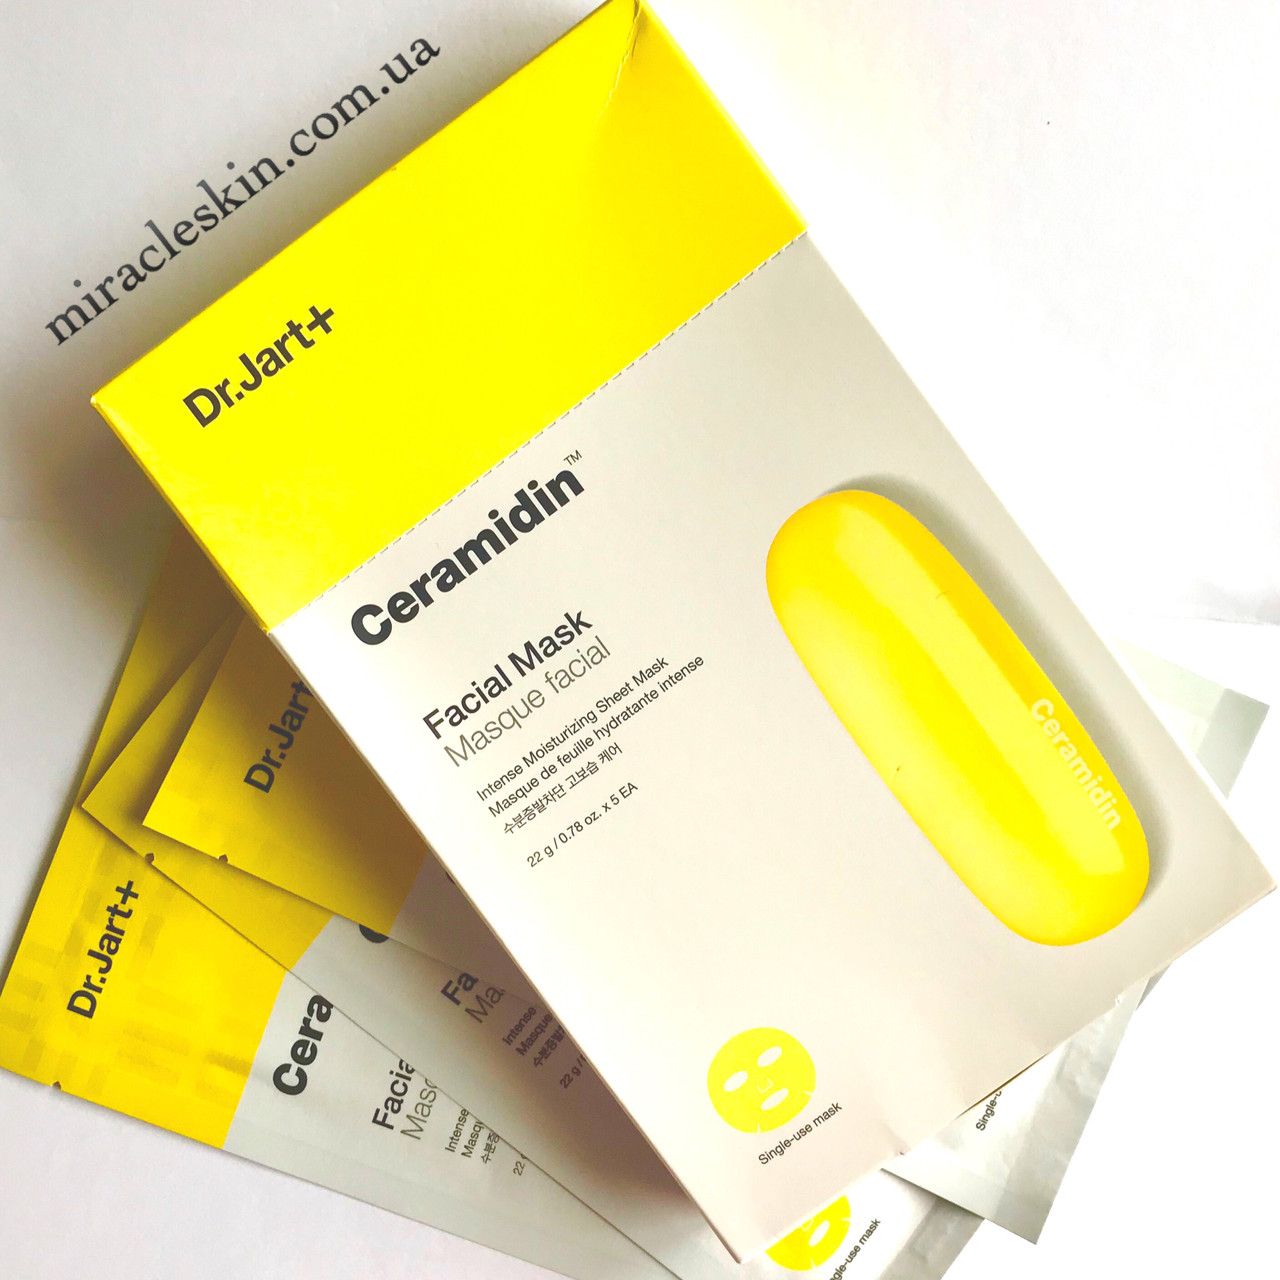 Ультра-увлажняющая гипоаллергенная тканевая маска  Dr. Jart Ceramidin Skin-friendly Nanoskin Sheet Mask 25g